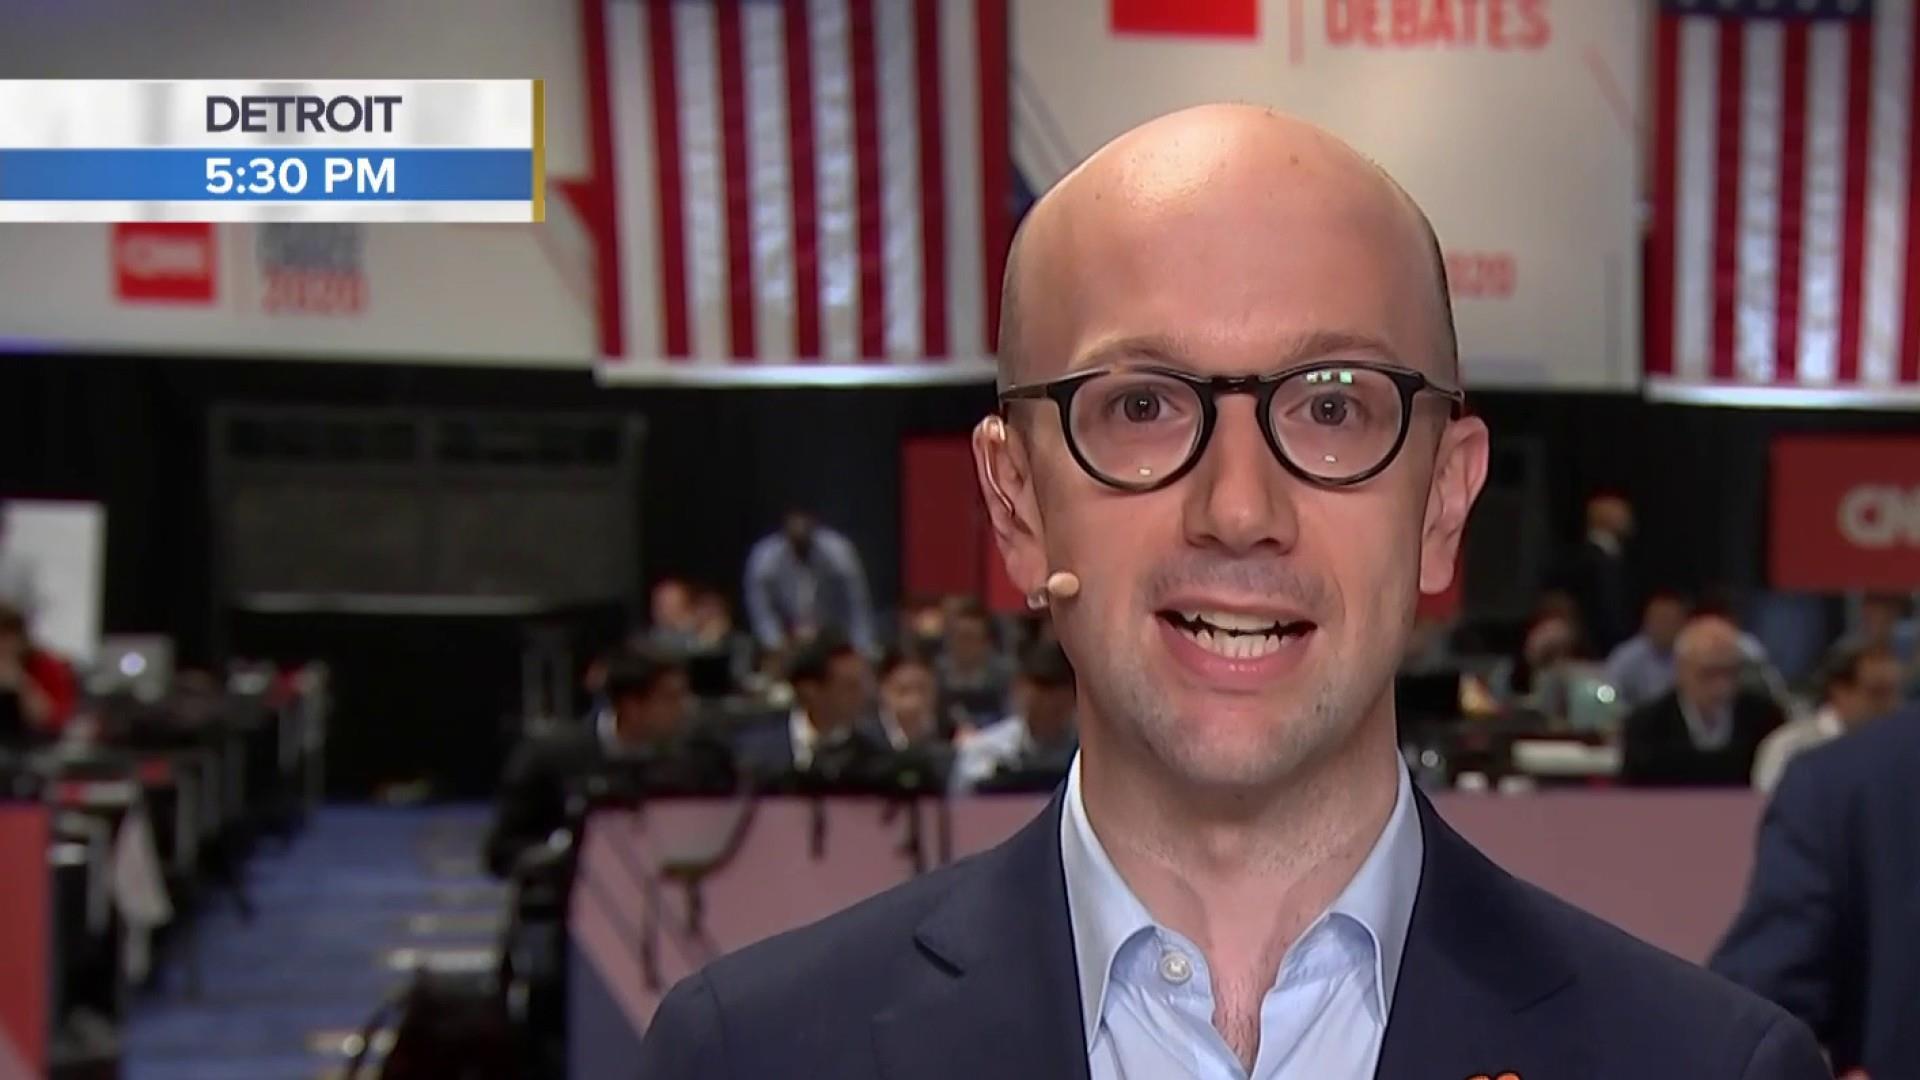 Full Sams: Harris won't go after Biden in Wednesday debate like 'boxing bout'